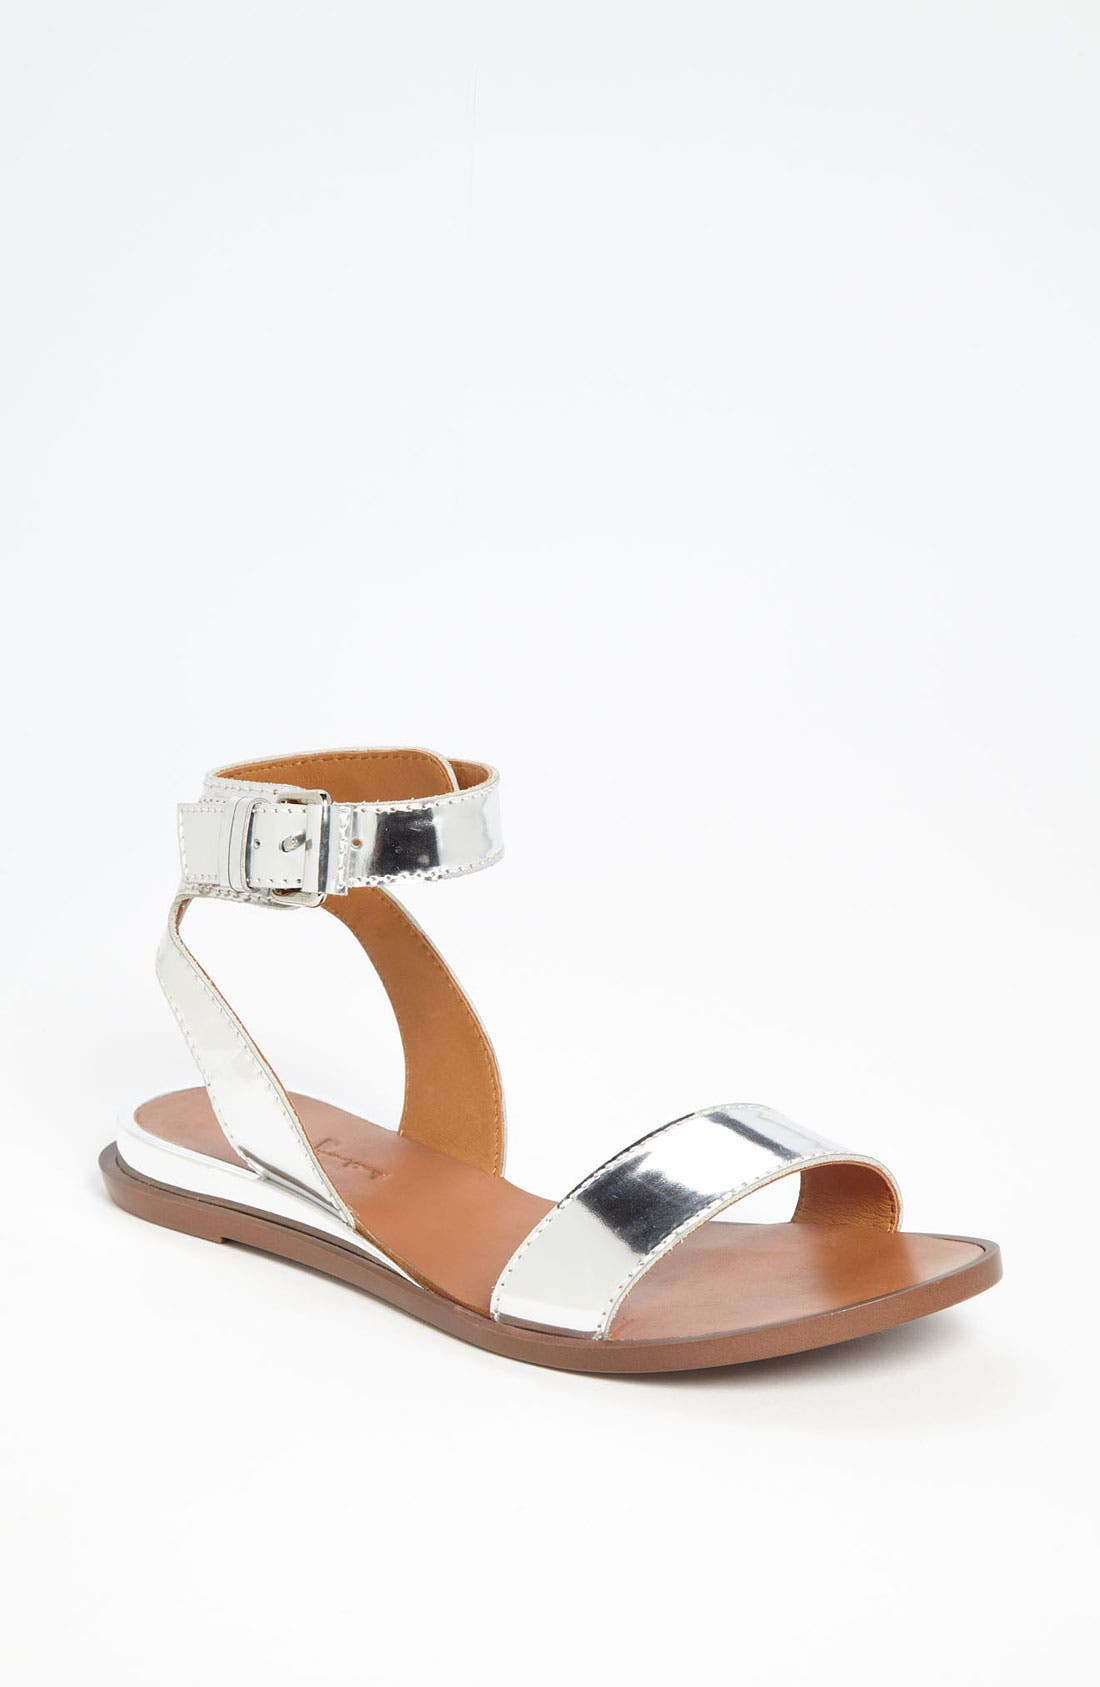 Alternate Image 1 Selected - 7 For All Mankind® 'Maura' Sandal